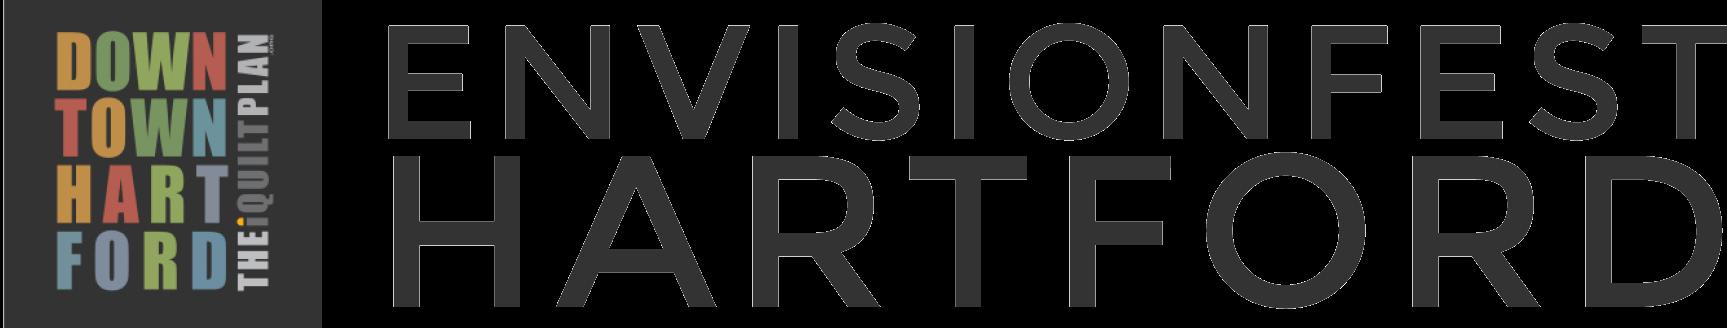 envisionfest1.png